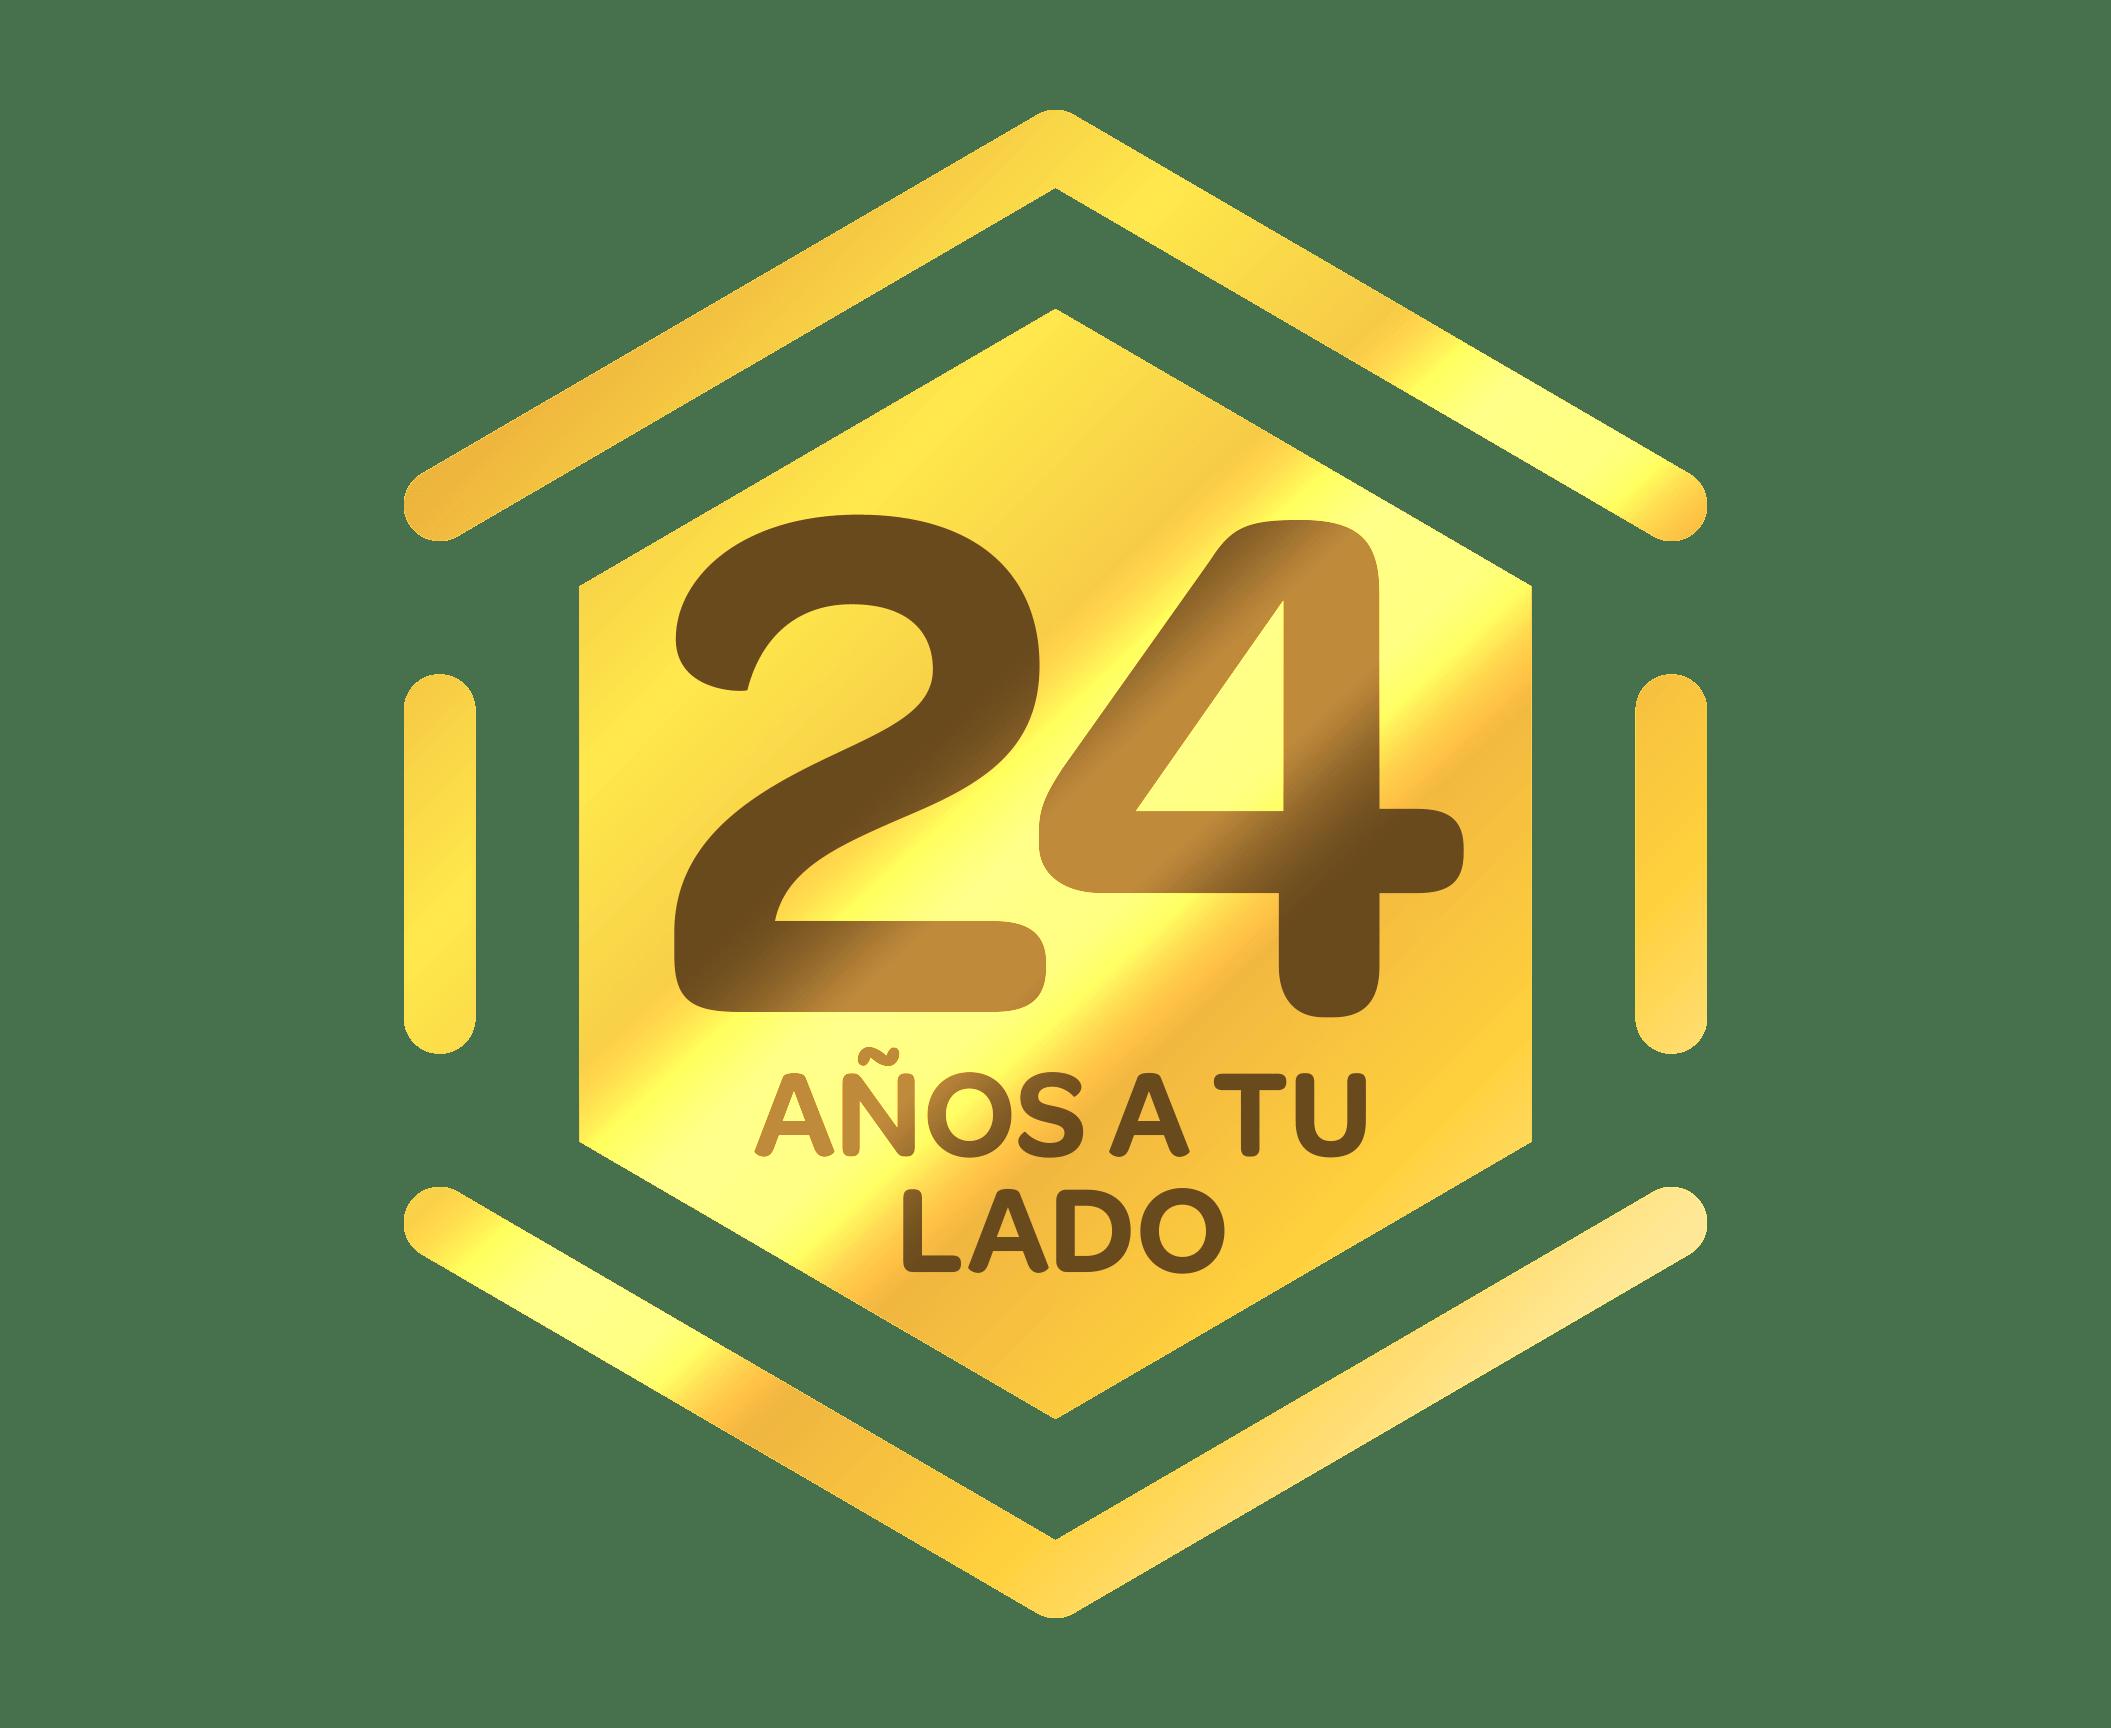 LIFE Informàtica - 24 años a tu lado